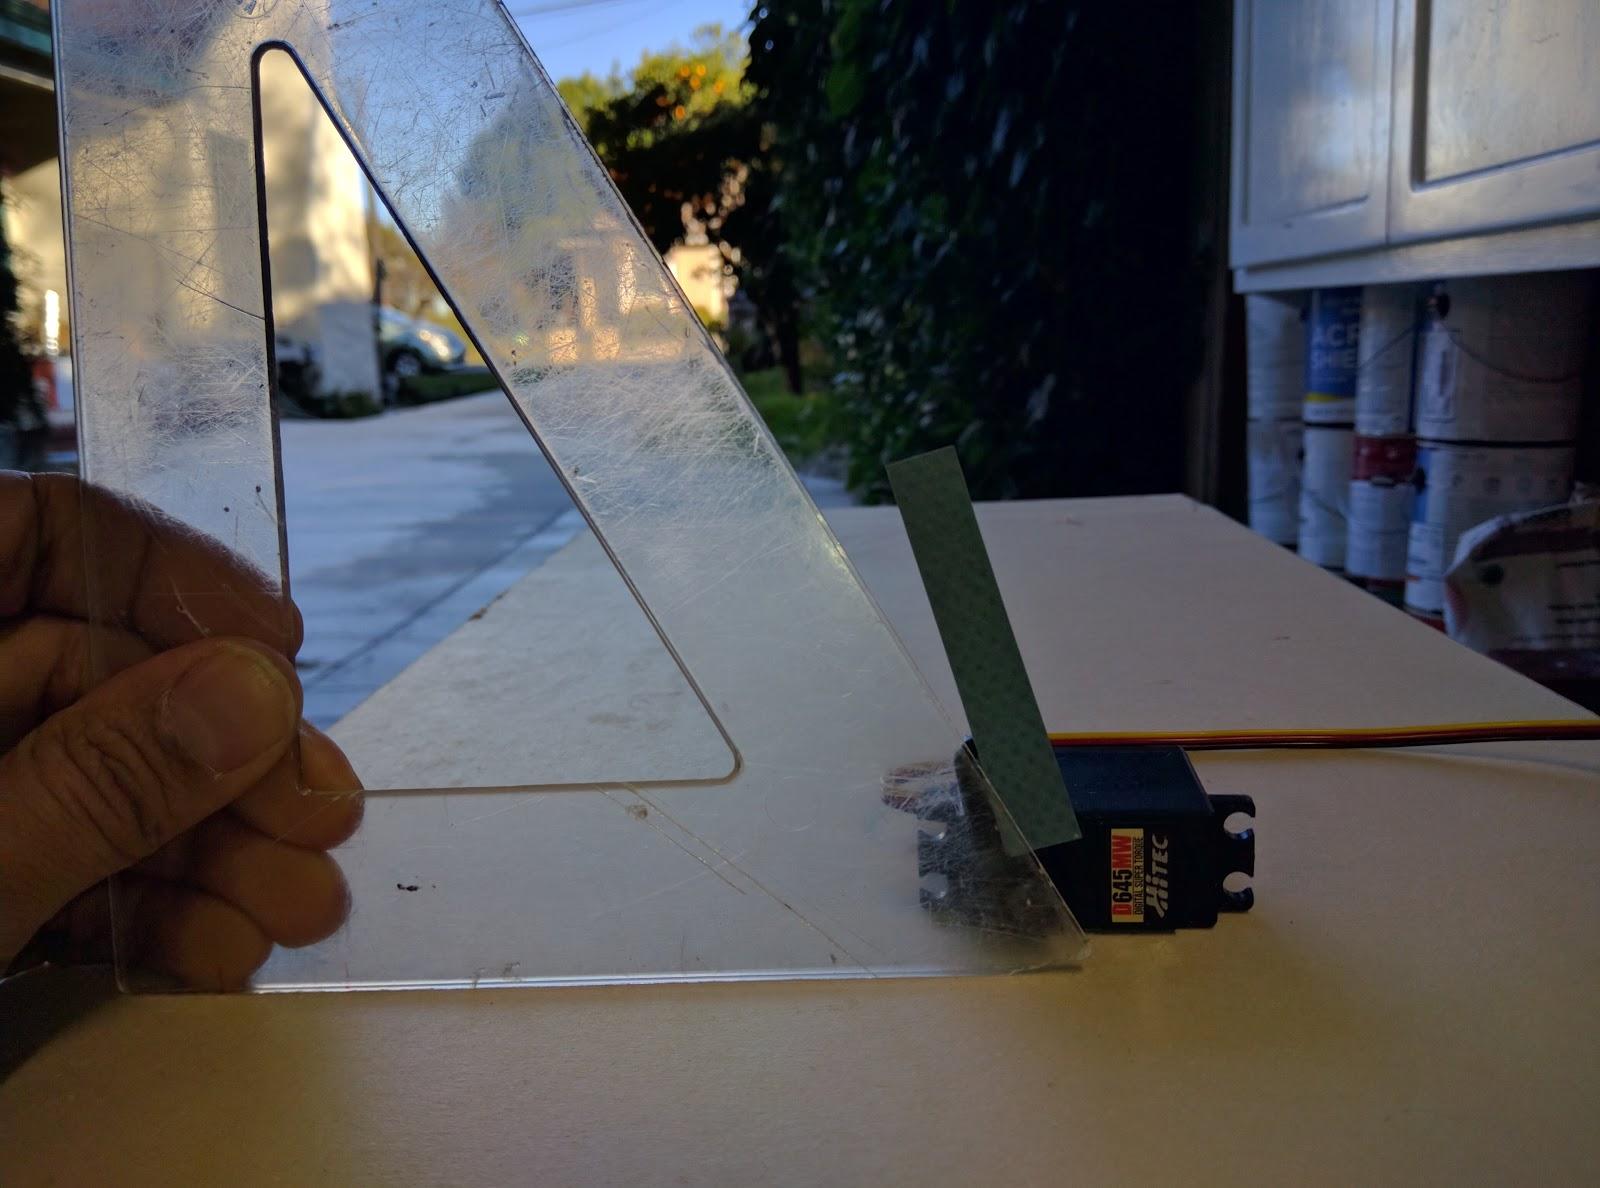 Airball aero: Hobby servo accuracy is poor